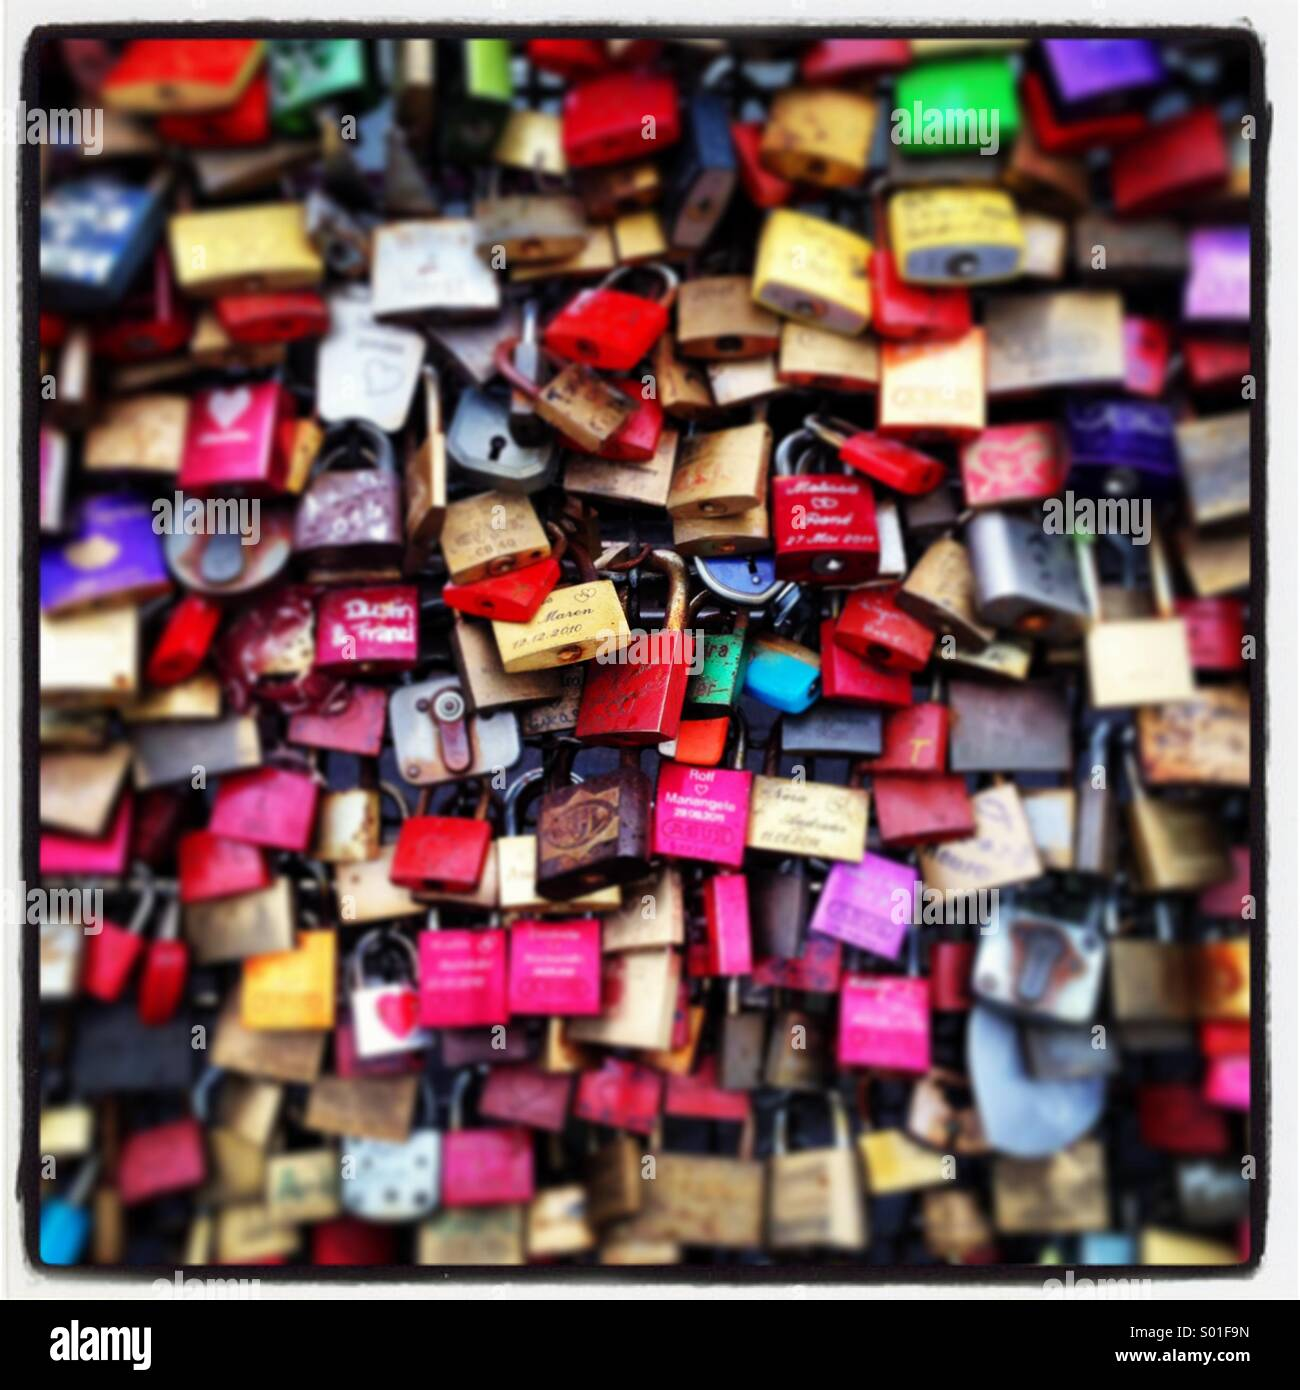 Locked locks simbolizing love - Stock Image